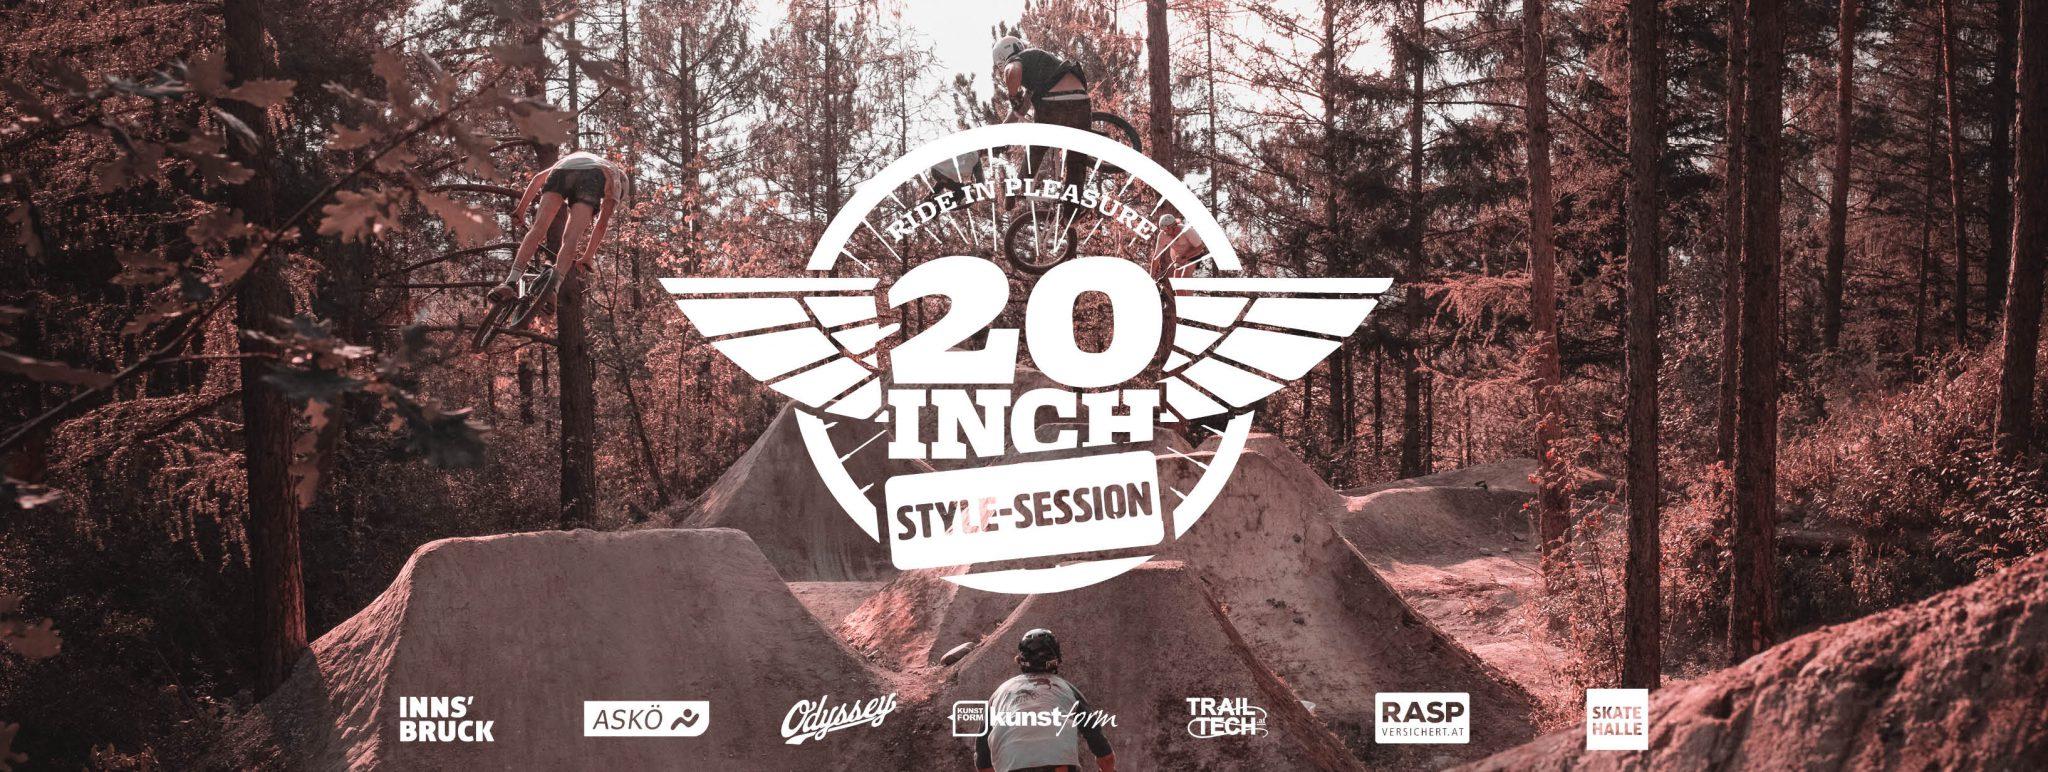 Dirtpark Opening Innsbruck 20Inch Trophy Rip BMX